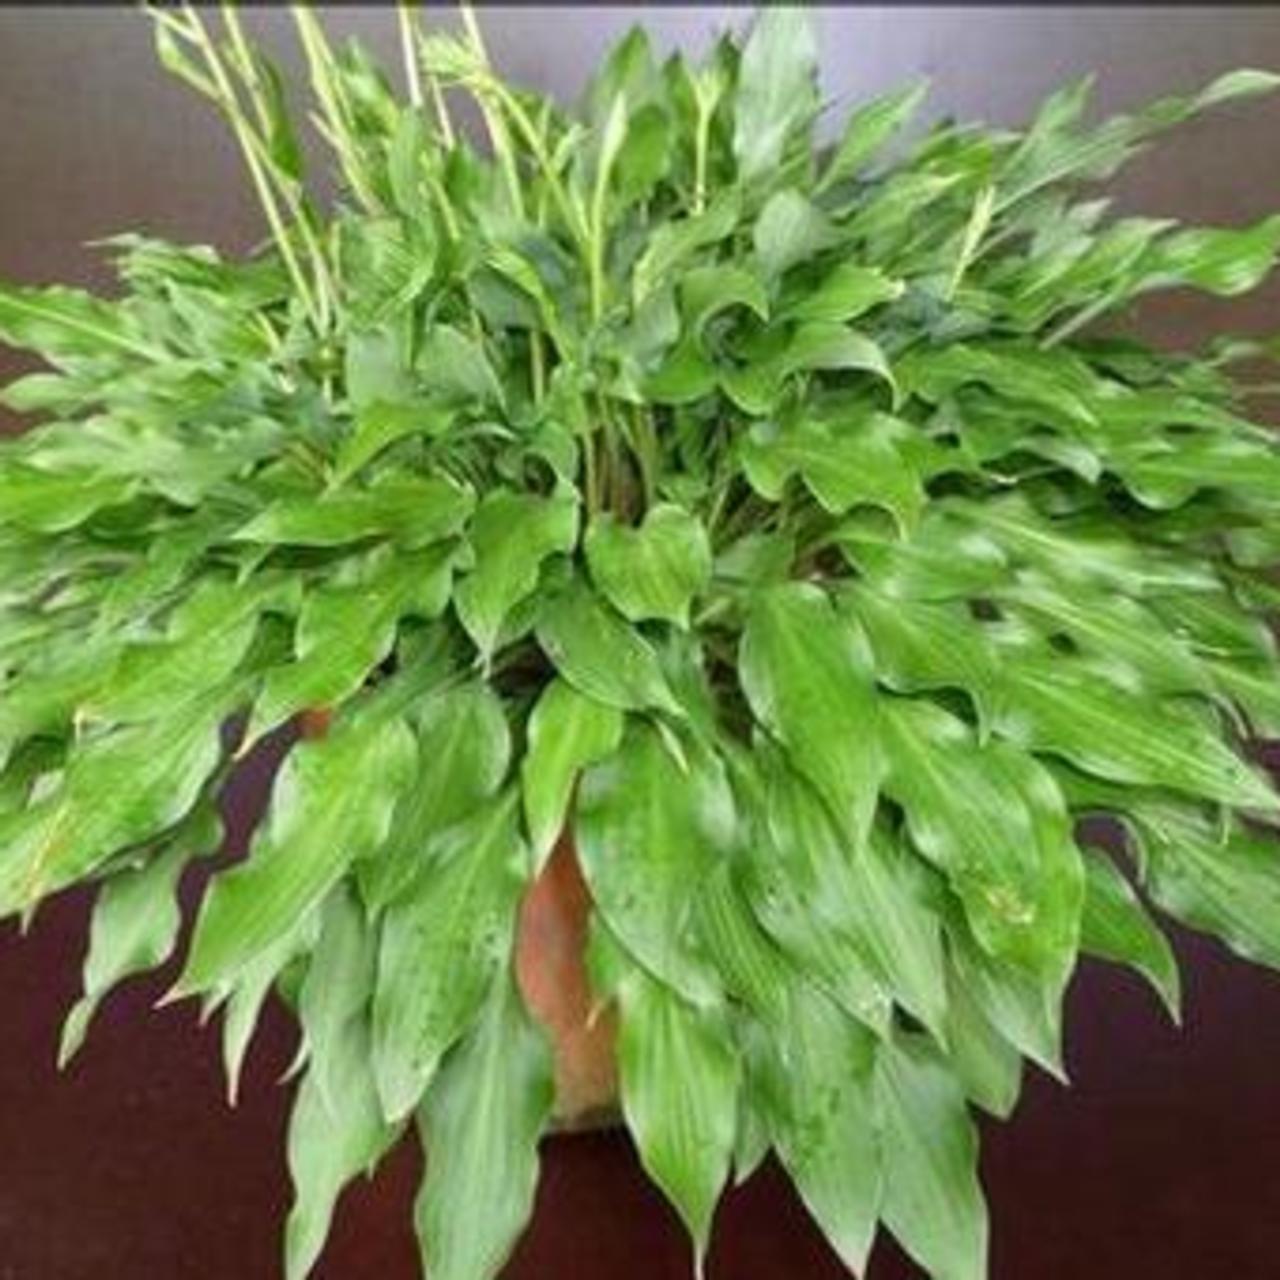 Hosta 'Quill' plant